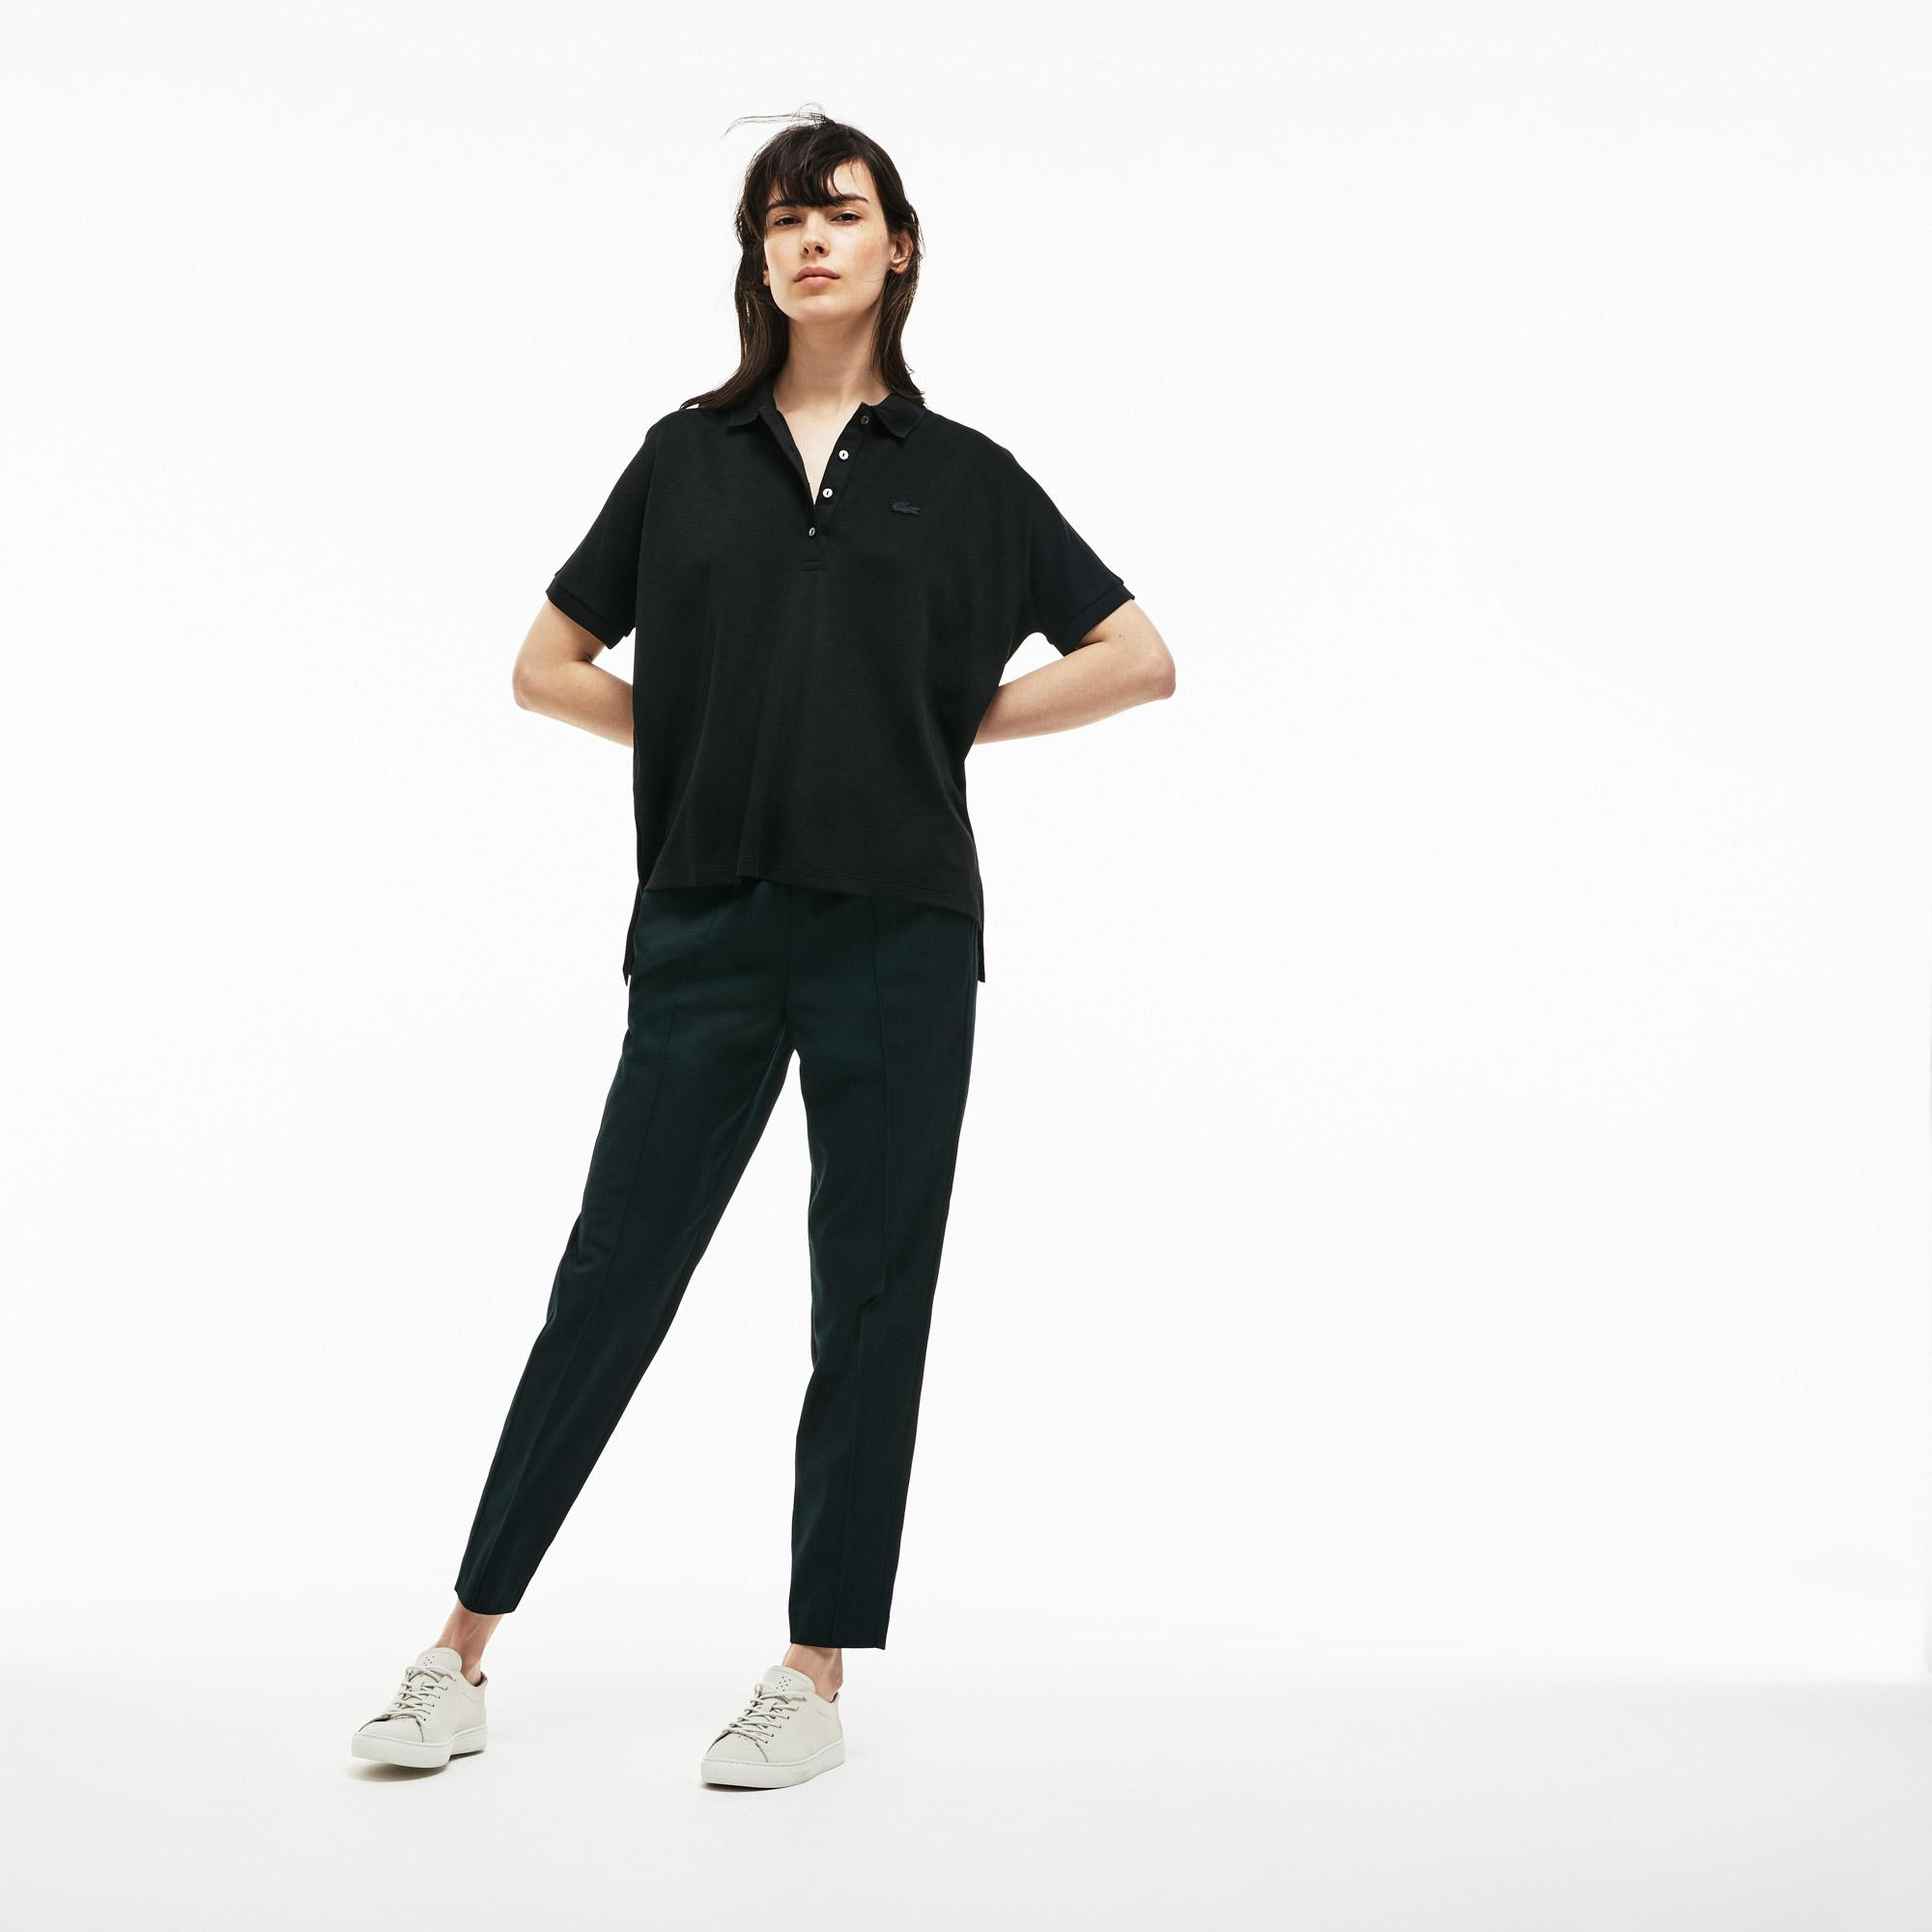 Lacoste Kadın Rahat Kesim Siyah Polo